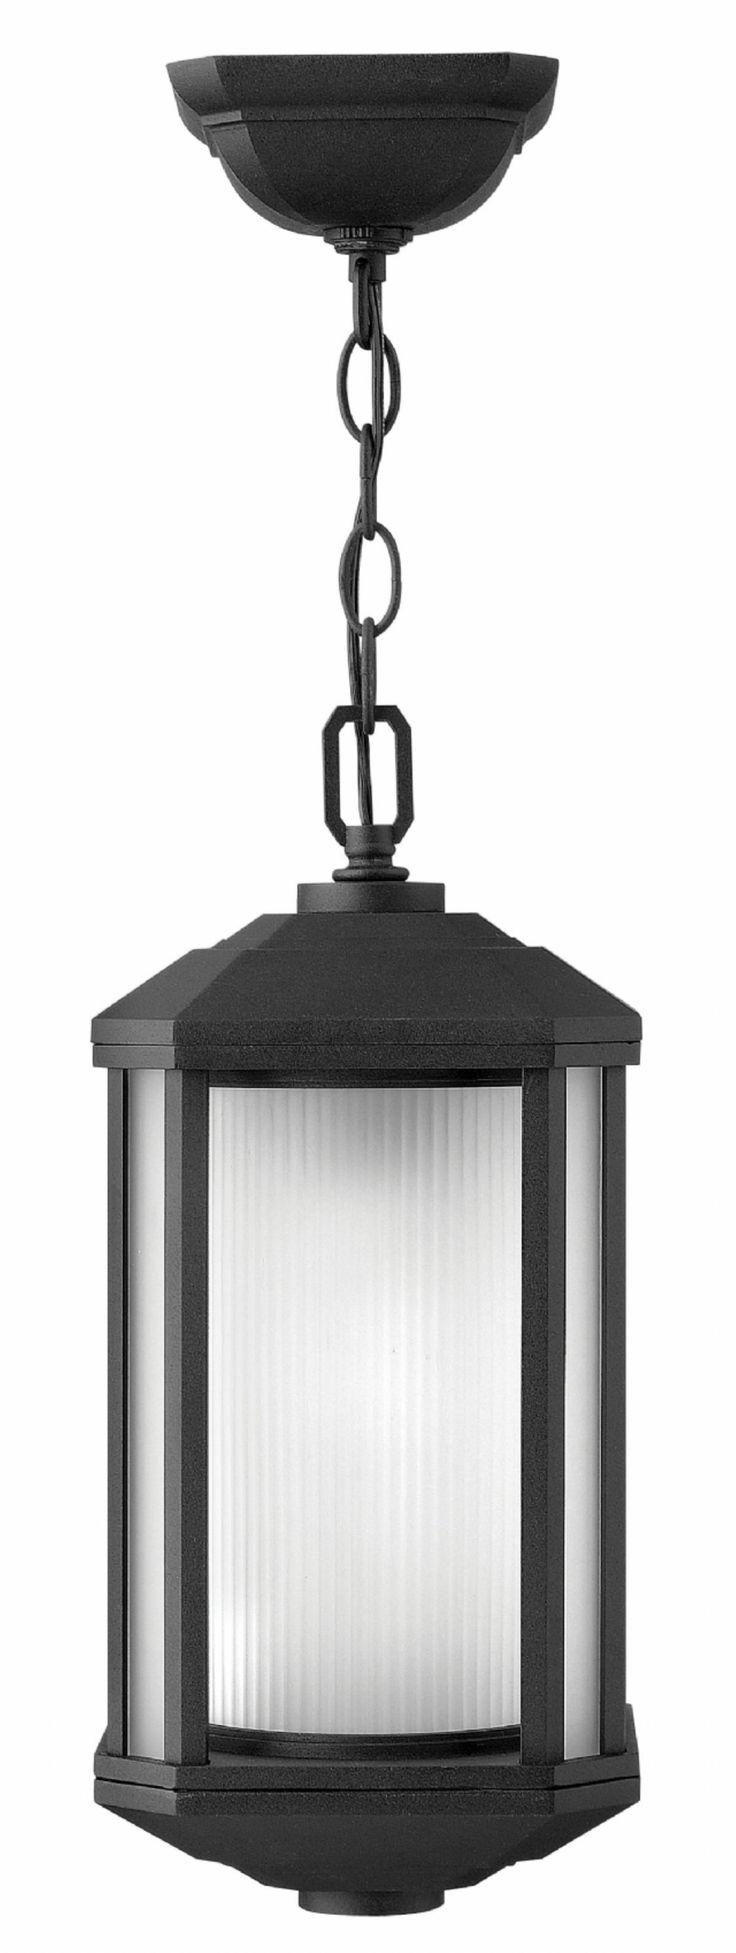 Title exterior lighting